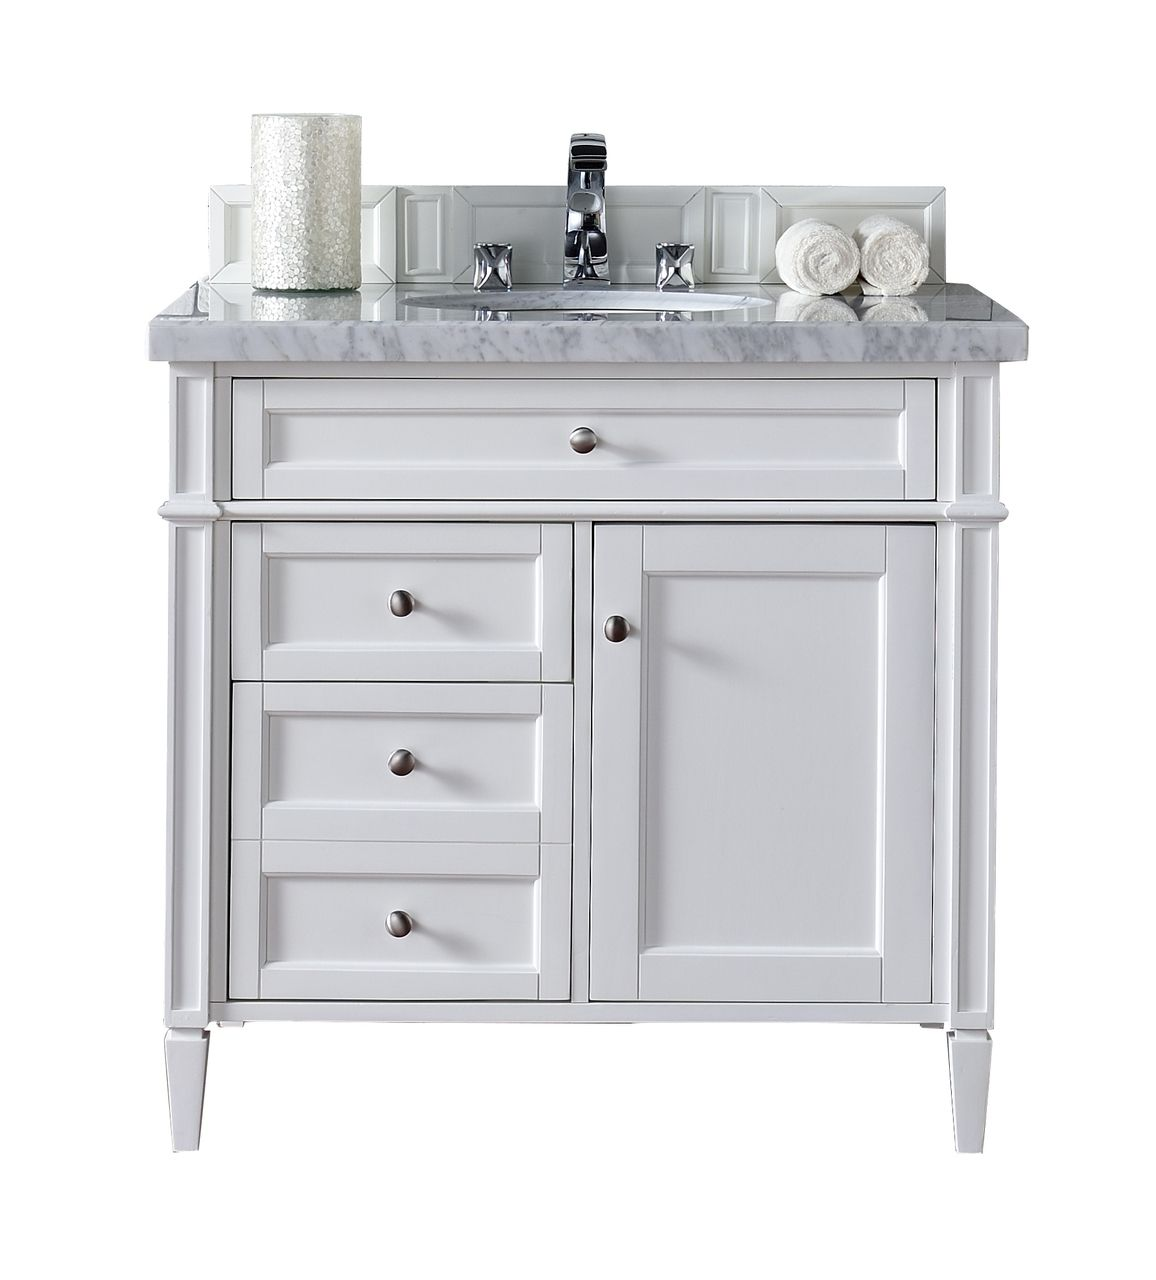 White 36 Inch Bathroom Vanity With Top 36 Inch Bathroom Vanity White Vanity Bathroom Bathroom Furniture Vanity